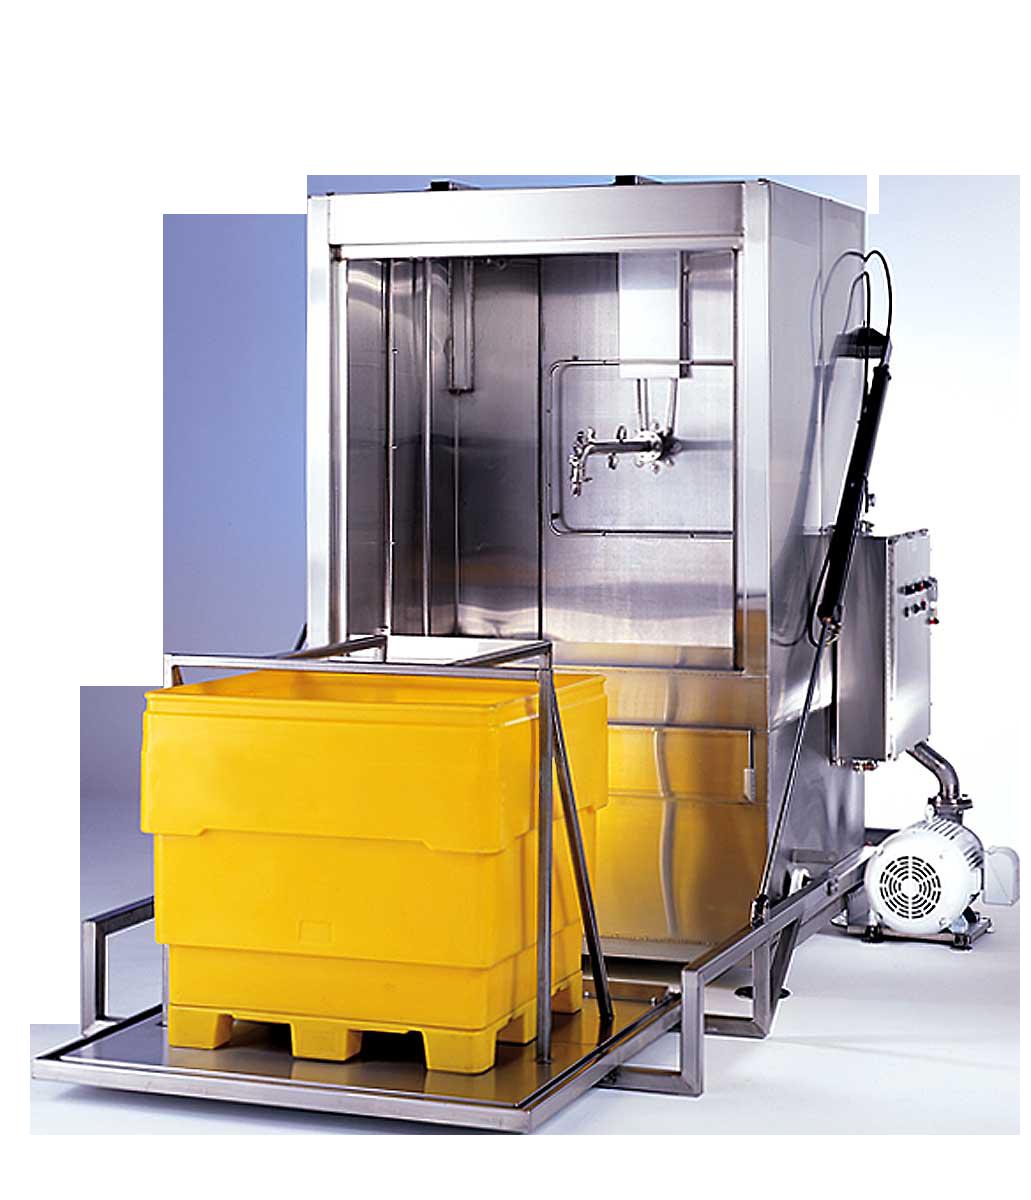 BW-1000-E Model Commercial Dishwasher Manufacturer Brand Partner Douglas Washing and Sanitizing Systems Safer Cleaner Faster Industrial Dishwasher Restaurant Dishwasher Food Industry Cleaning Machines